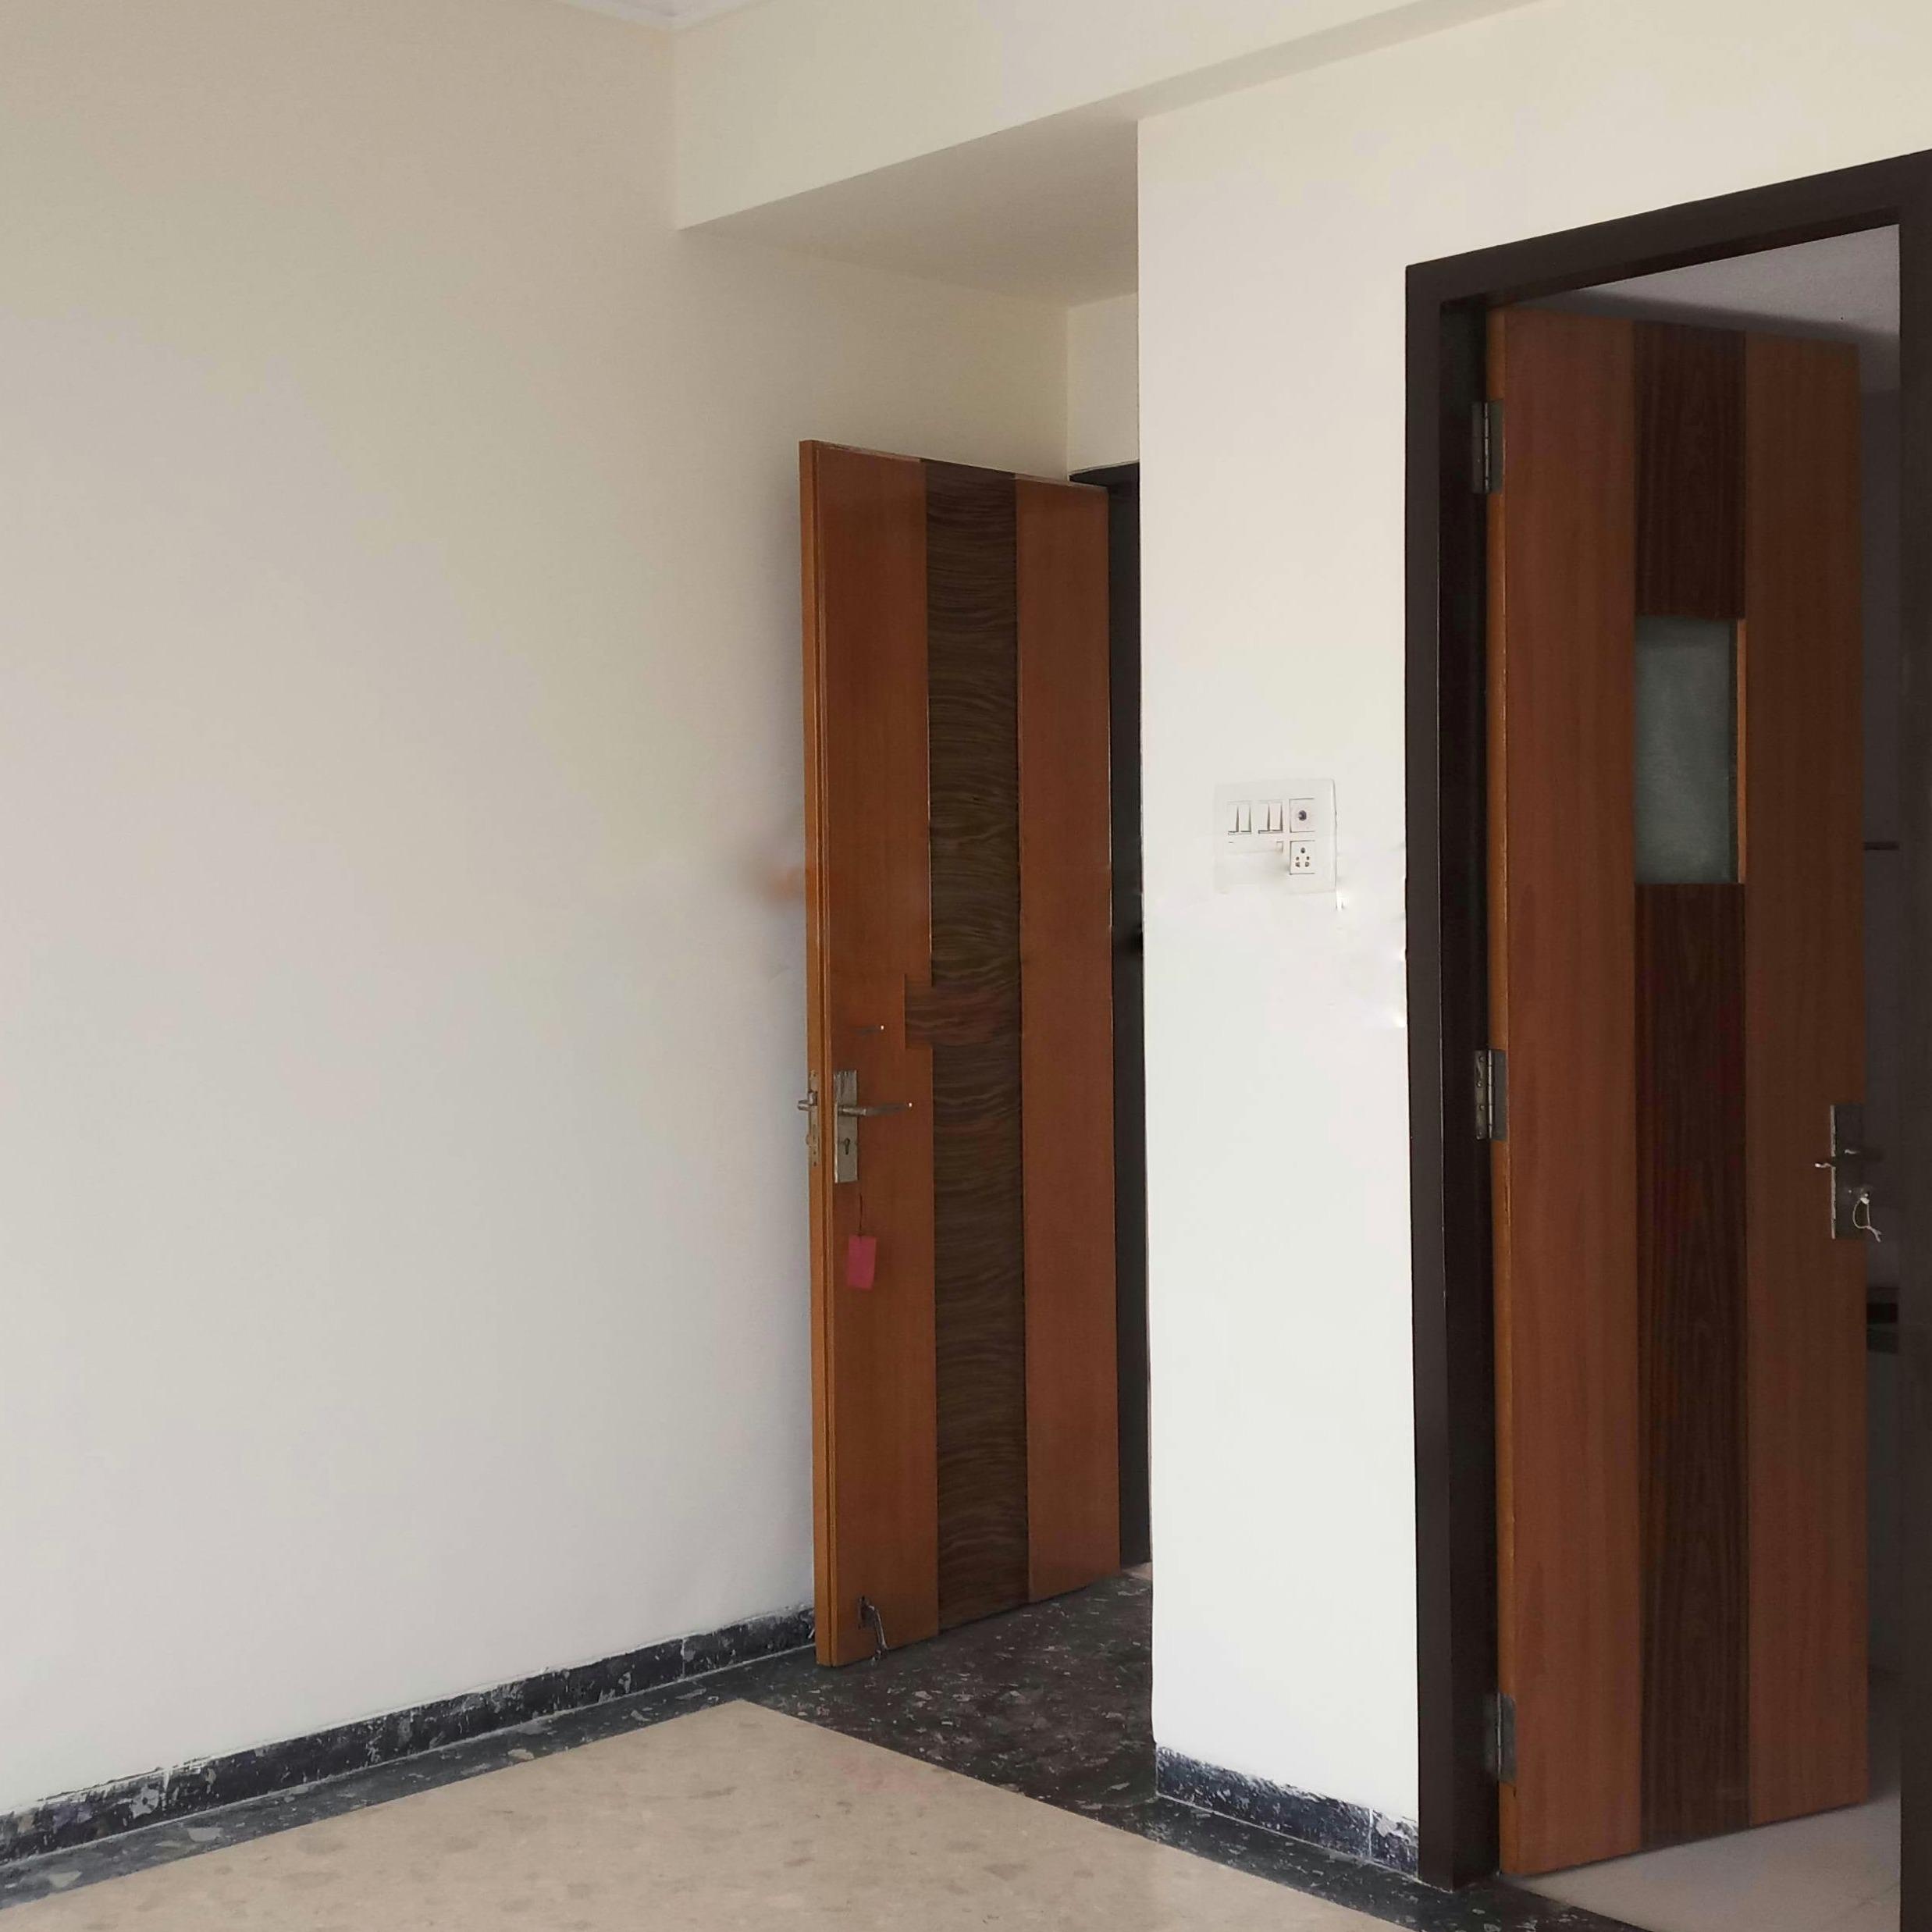 room-Picture-akshar-sai-radiance-2663633